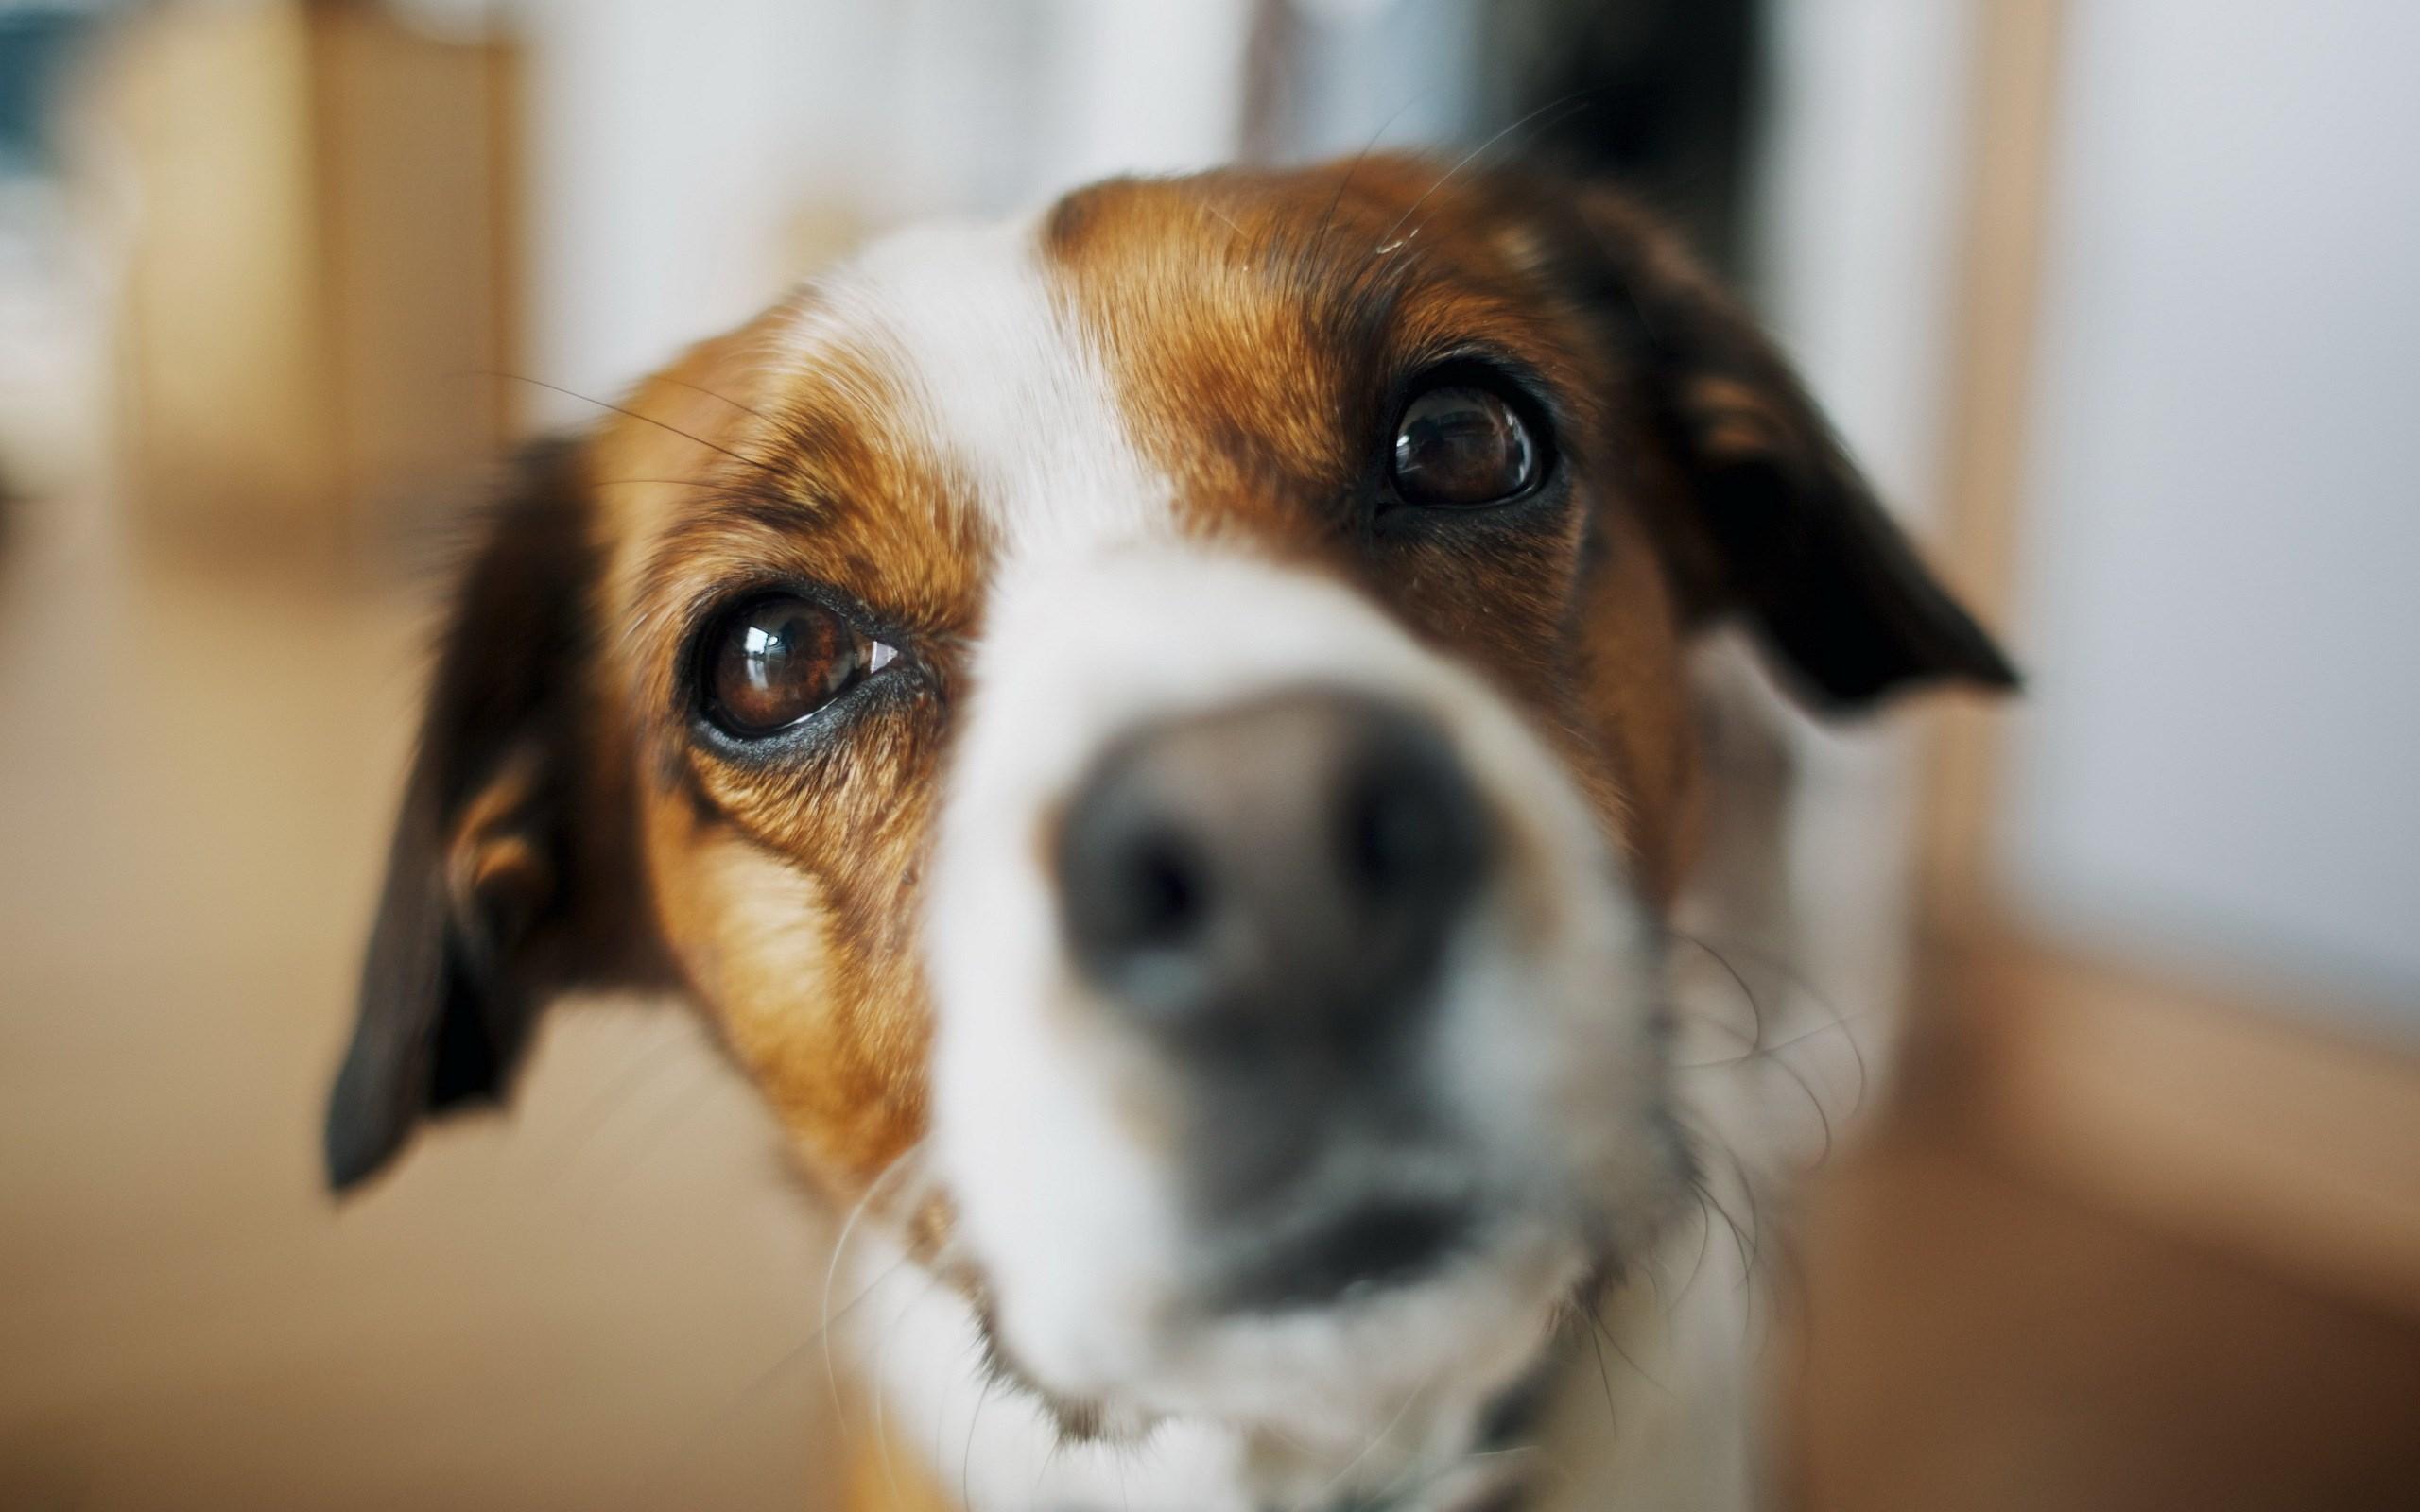 Dog Look Close-Up